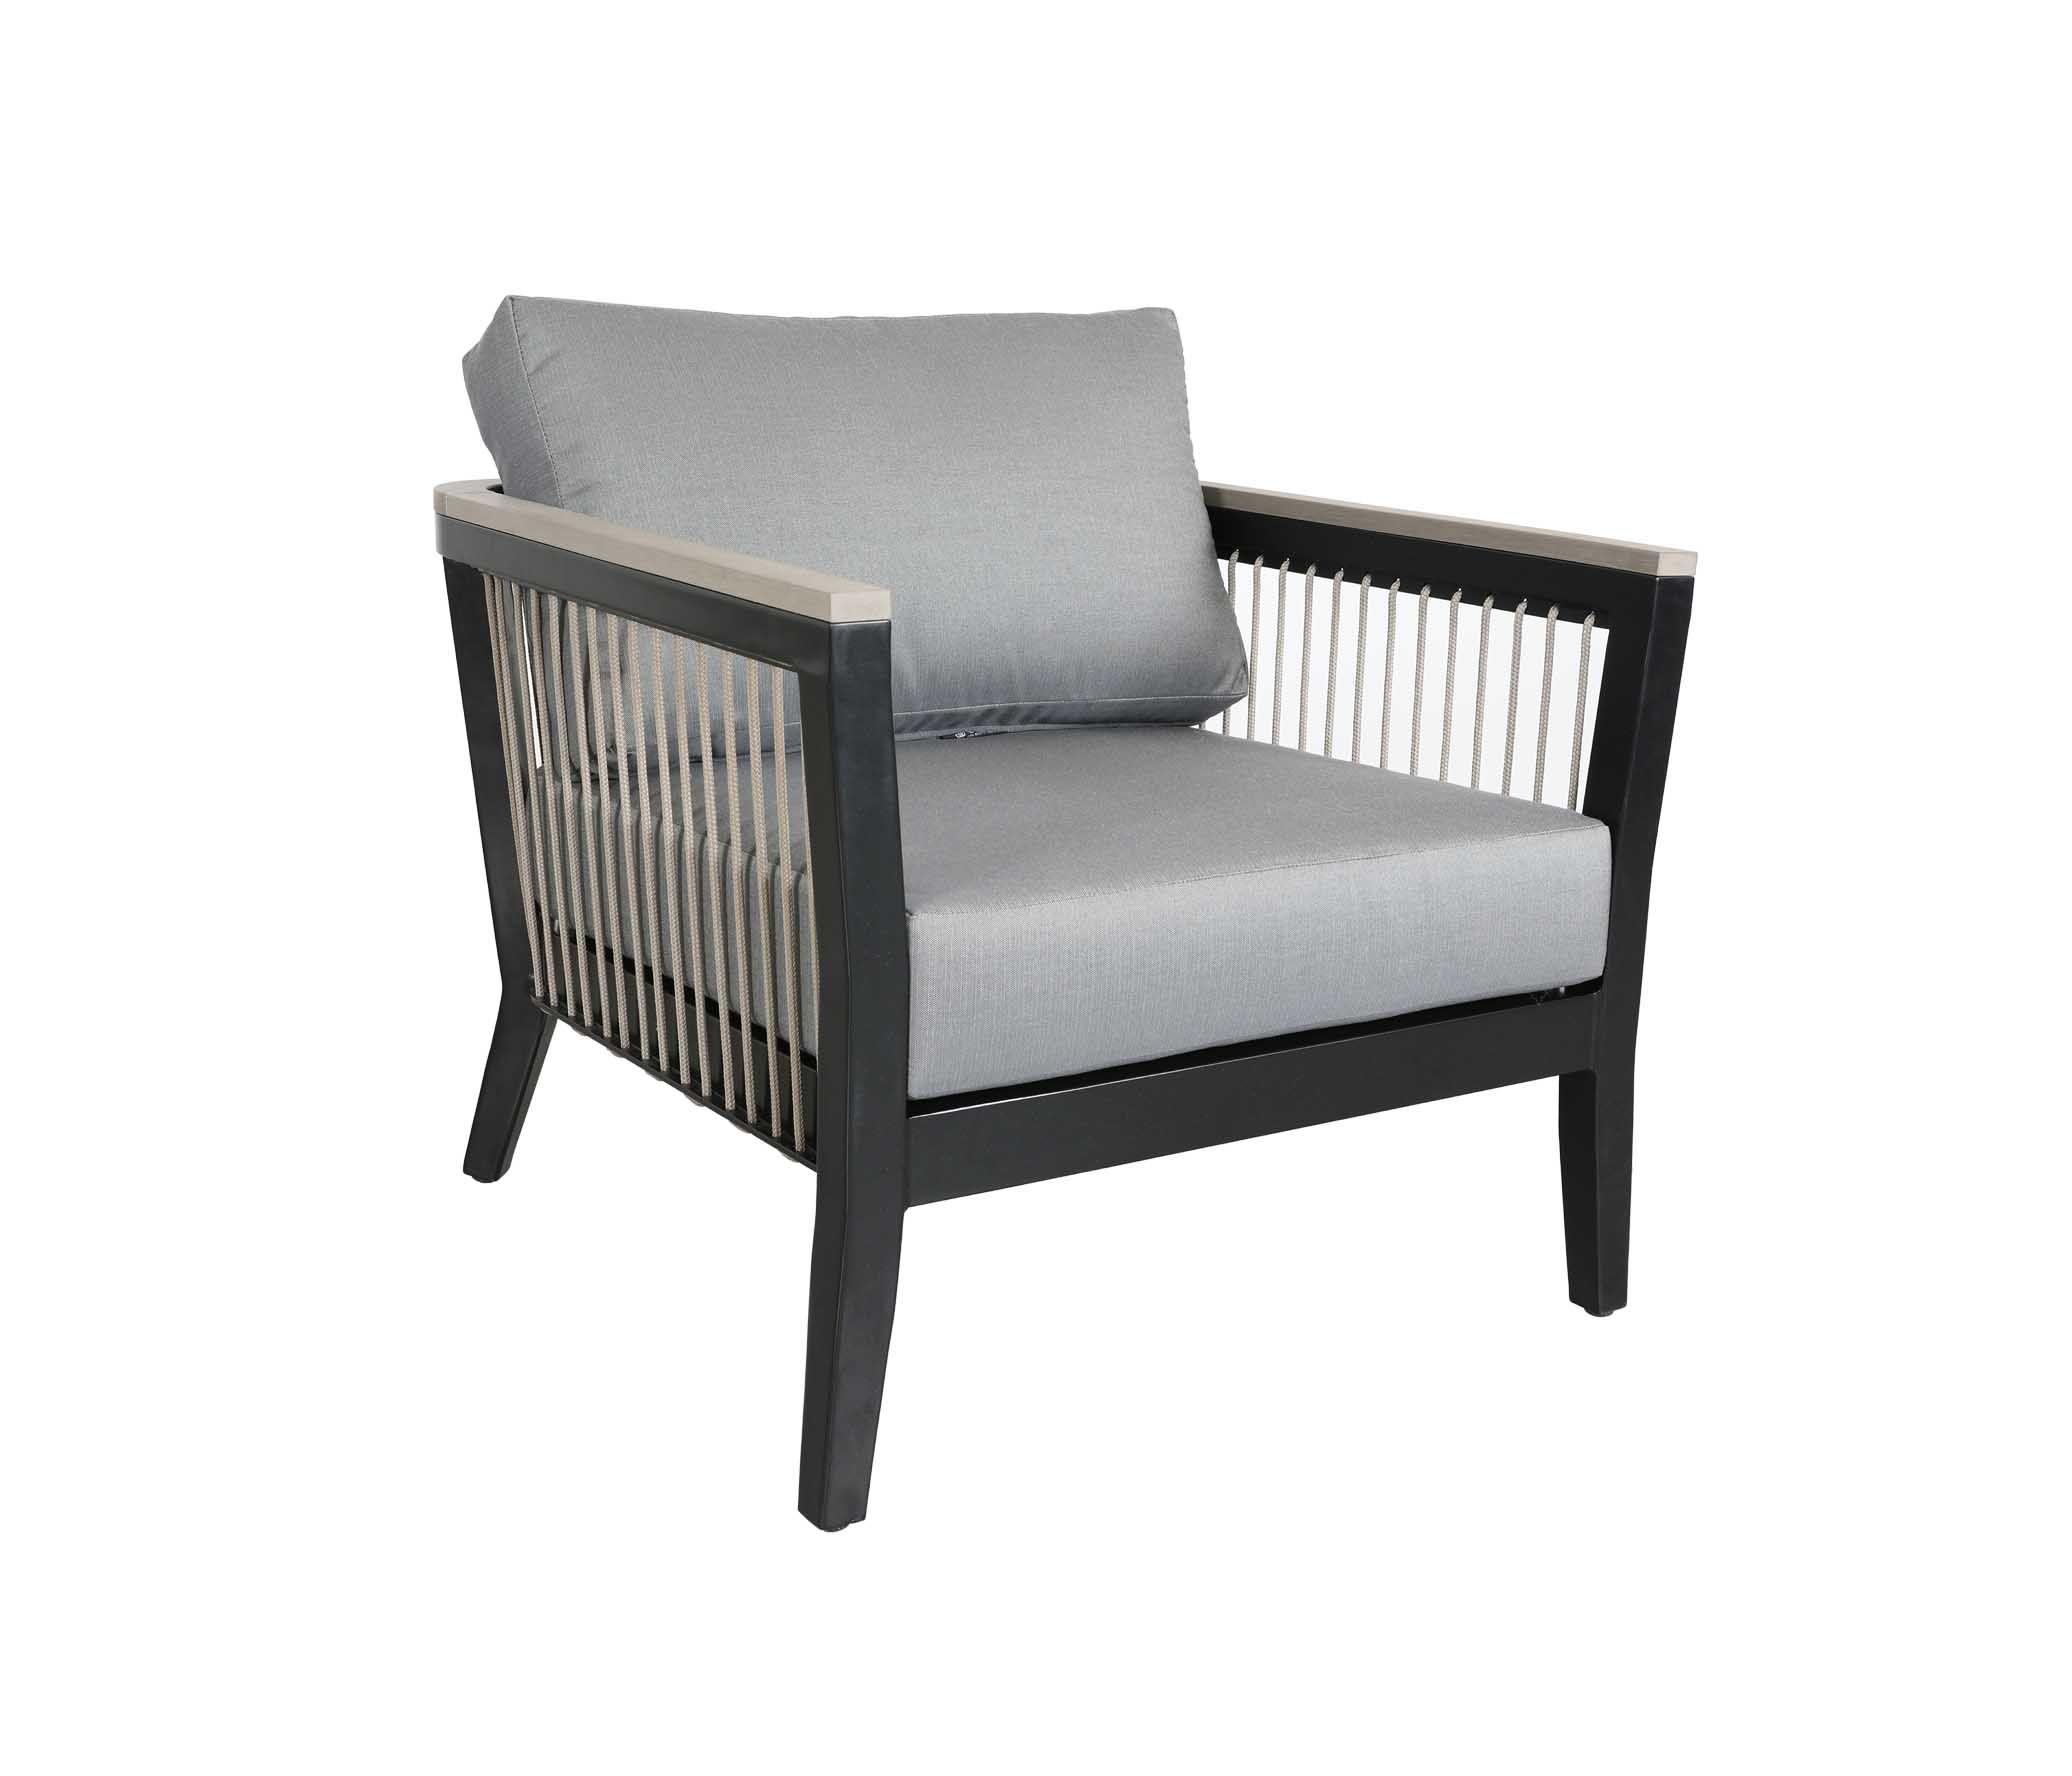 Shop Patio Furniture By Details Cabanacoast Store Locator